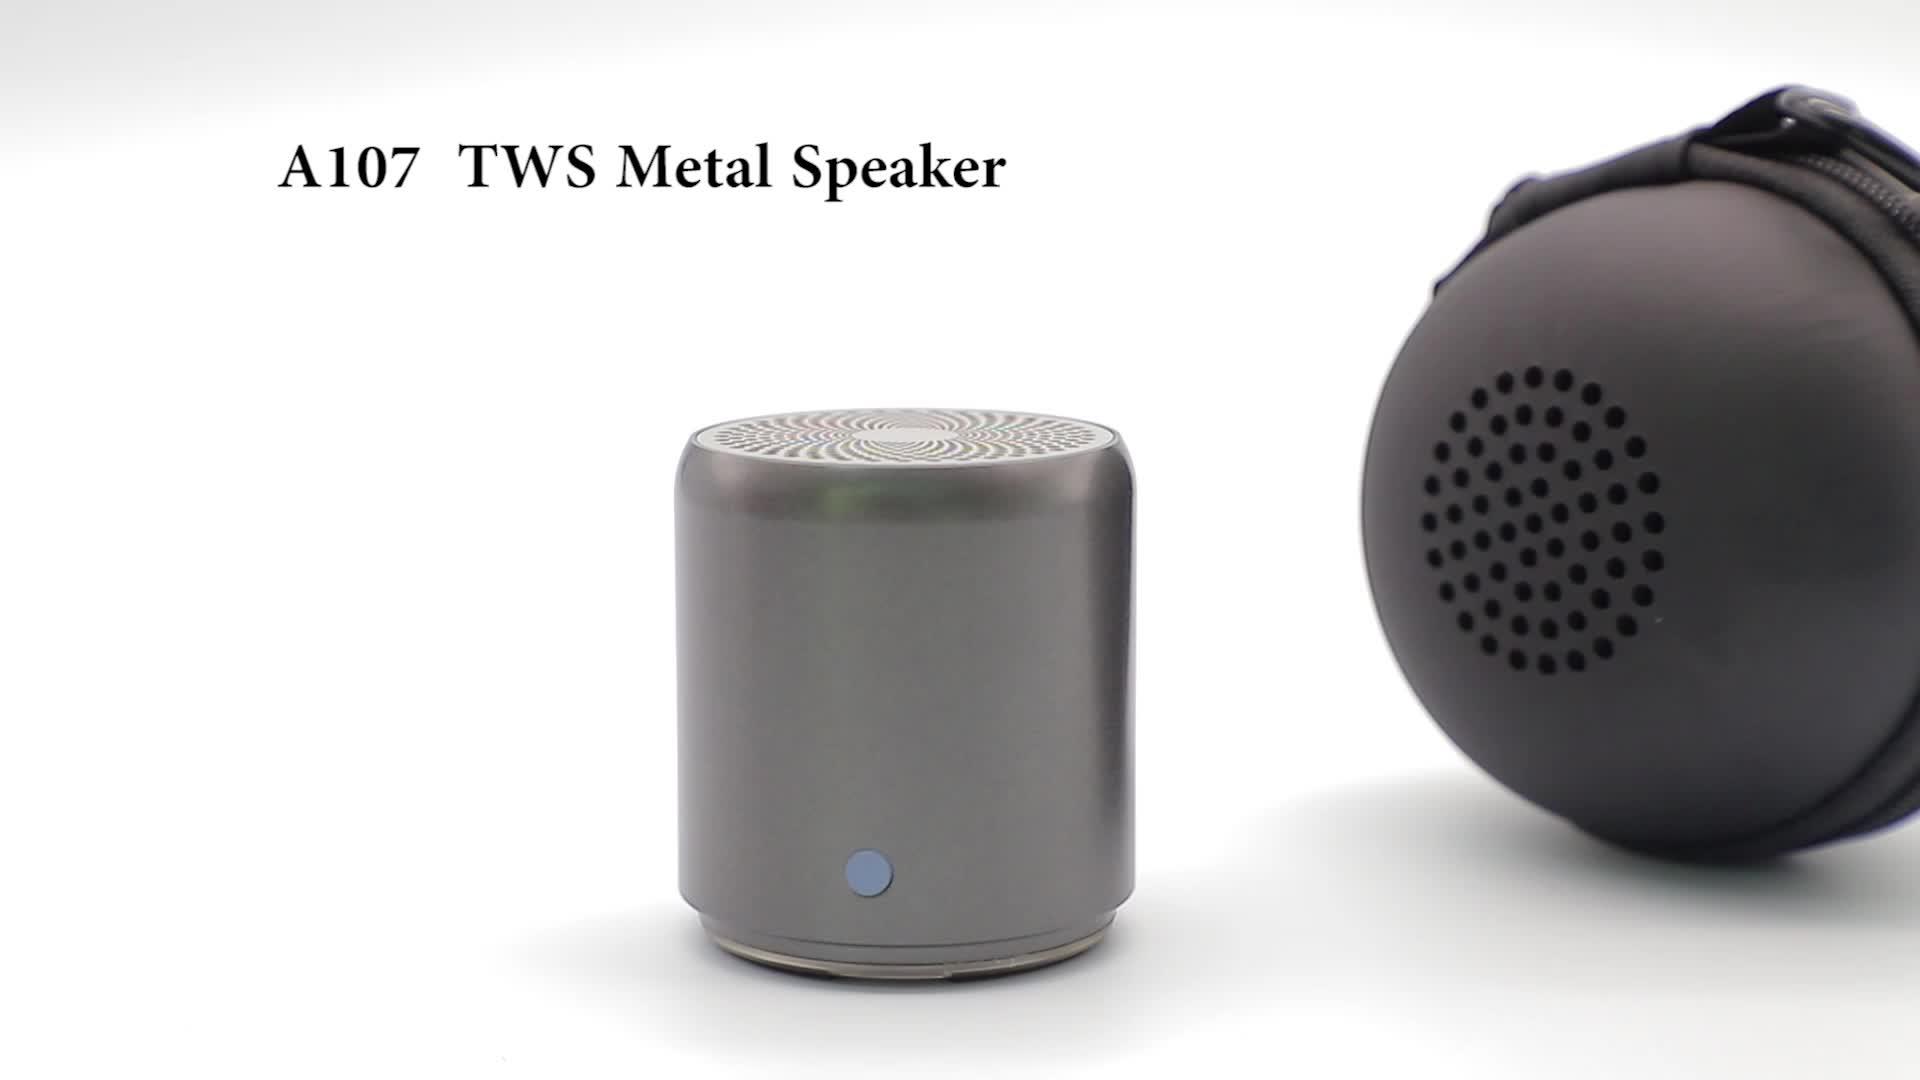 TWS A107 EWA Mini BT Gêmeos WirelessSpeaker Portátil de Metal clássico Do Bluetooth Estéreo de Som